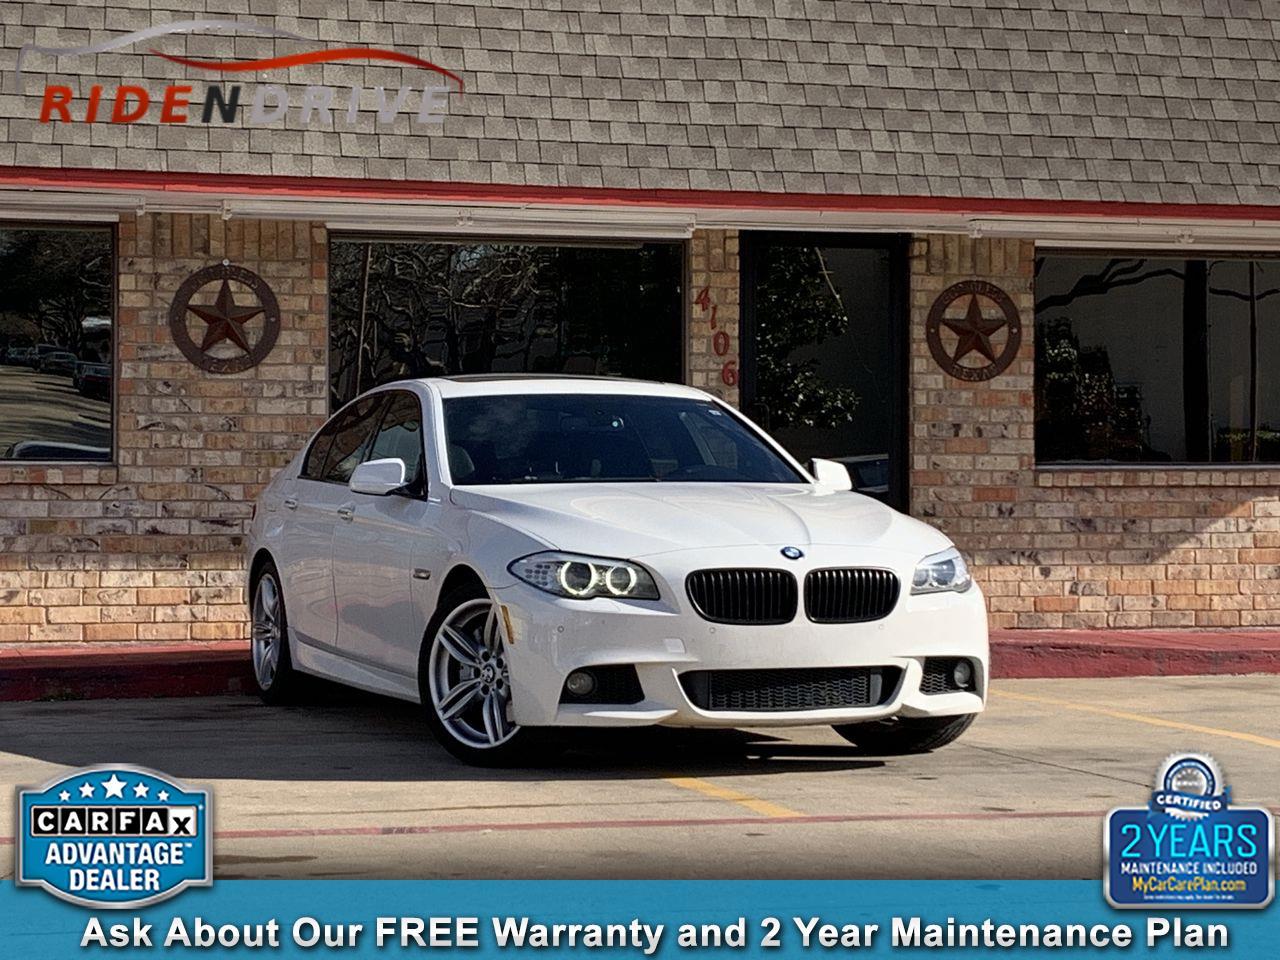 2012 BMW 5 Series 4dr Sdn 550i RWD